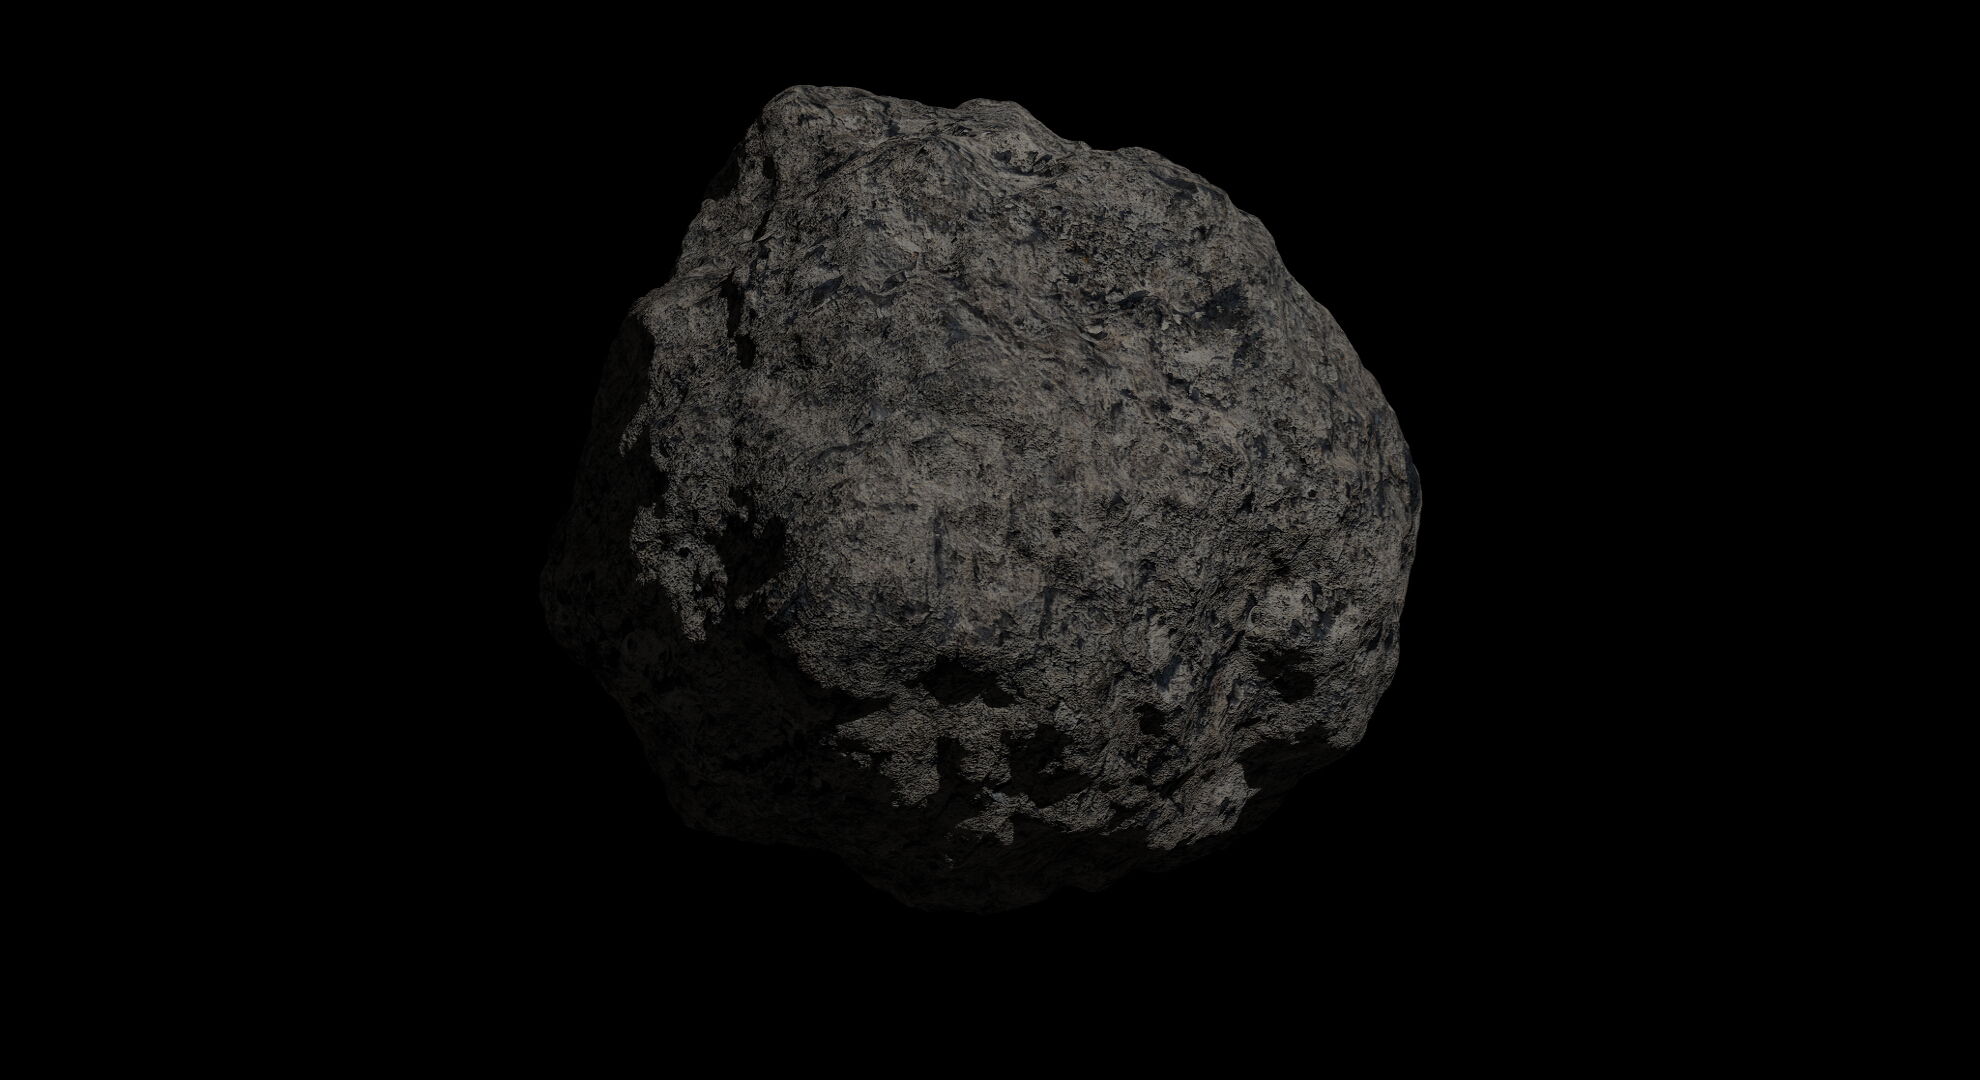 fantasy asteroid 2 3d model 3ds blend dae fbx obj 267200